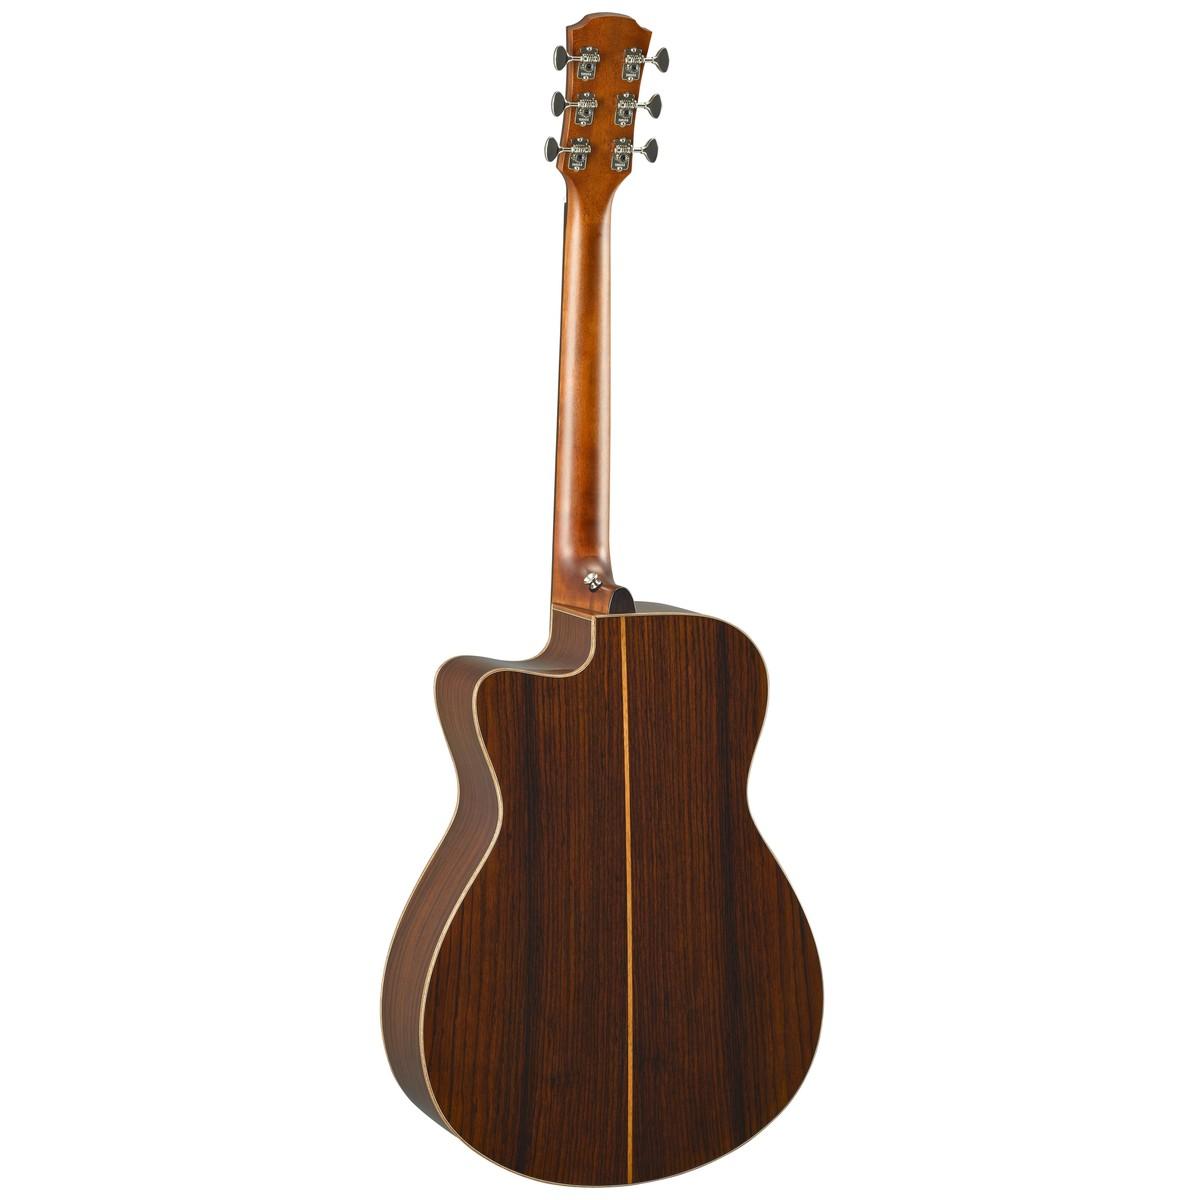 Yamaha ac5r rosewood electro acoustic guitar vintage for Acoustic yamaha guitar